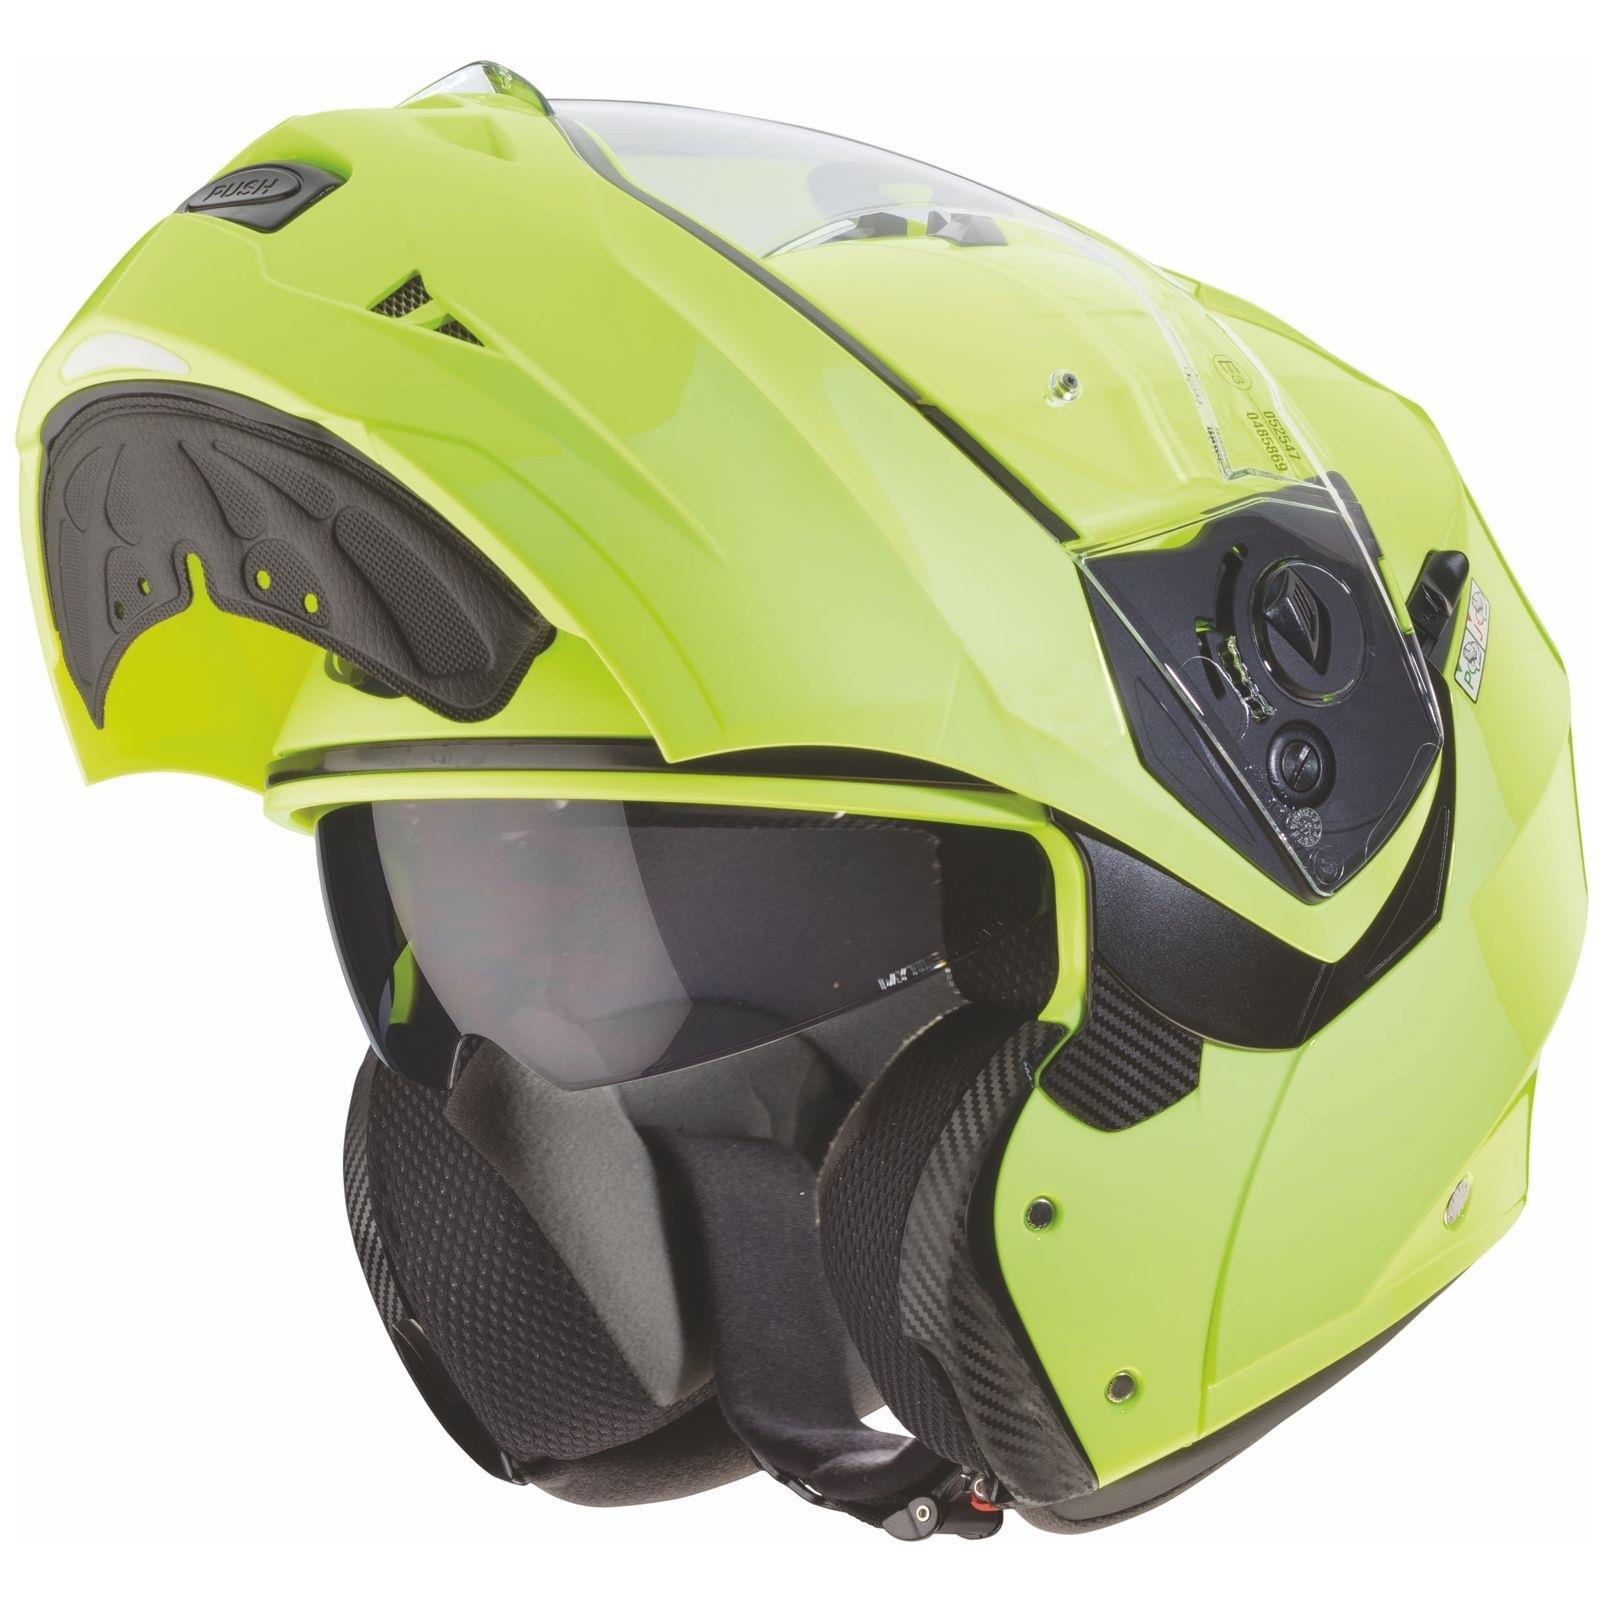 Caberg-Klapp-Helm-Duke-II-2-Motorrad-Belueftet-Sonnenblende-Pinlock-Visier-Jet Indexbild 23